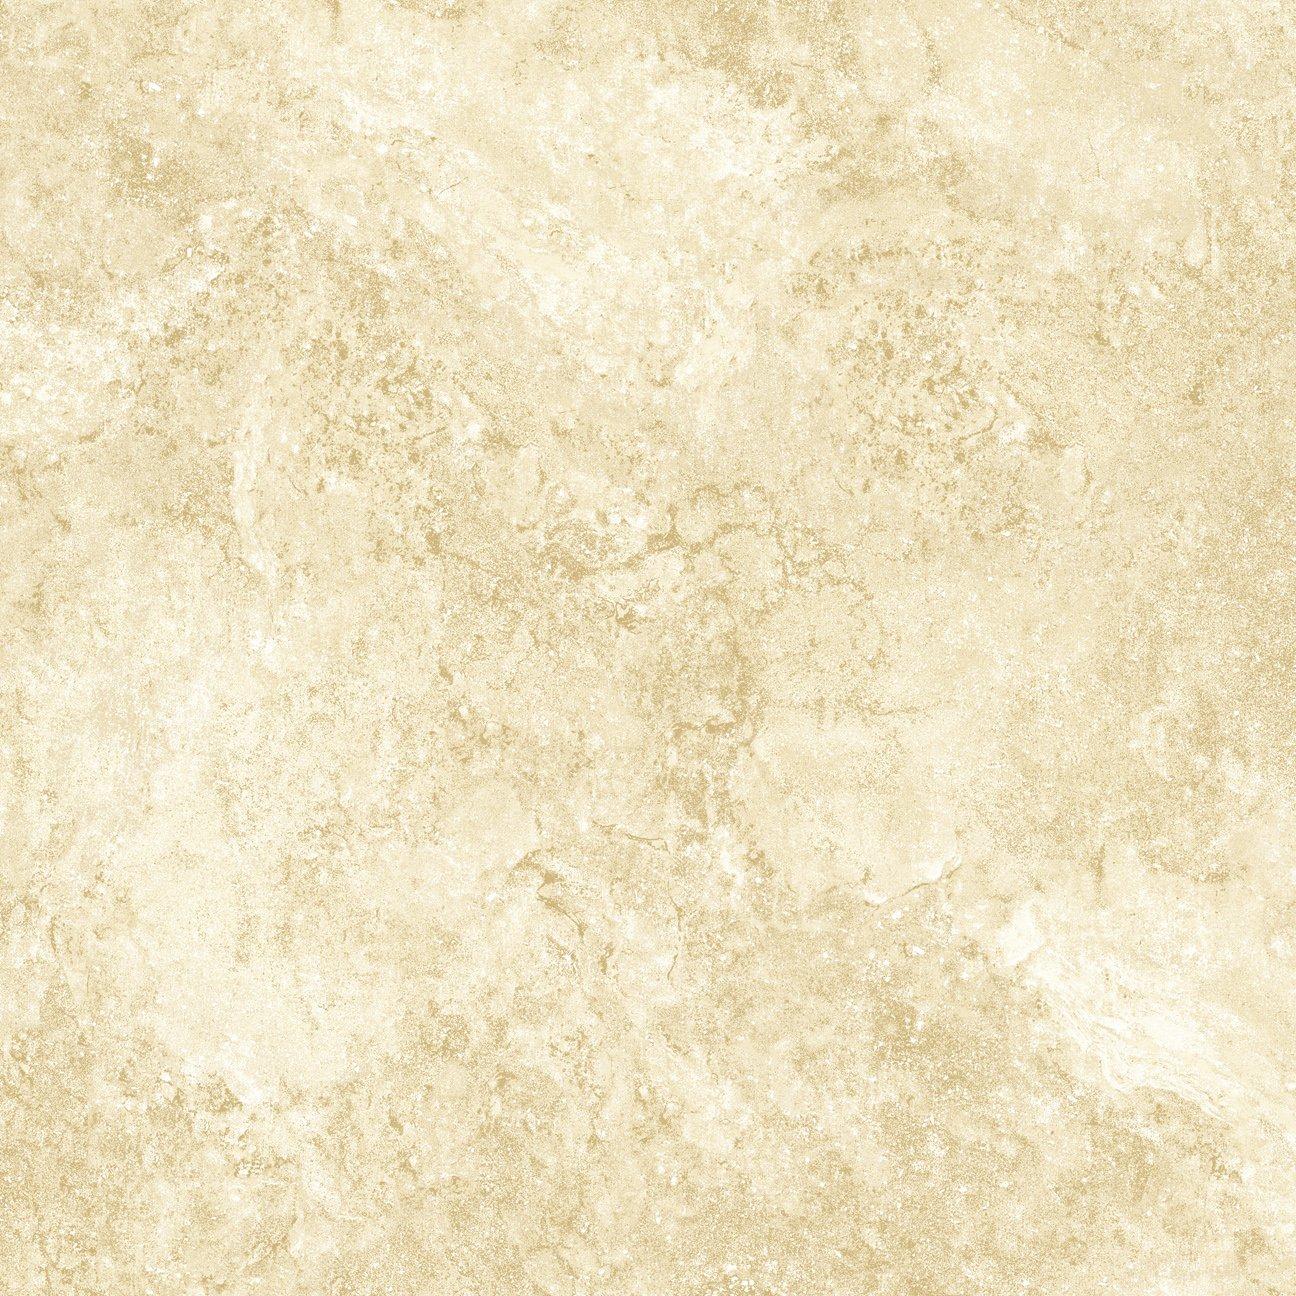 Stonehenge Gradations 39306-98 Onyx